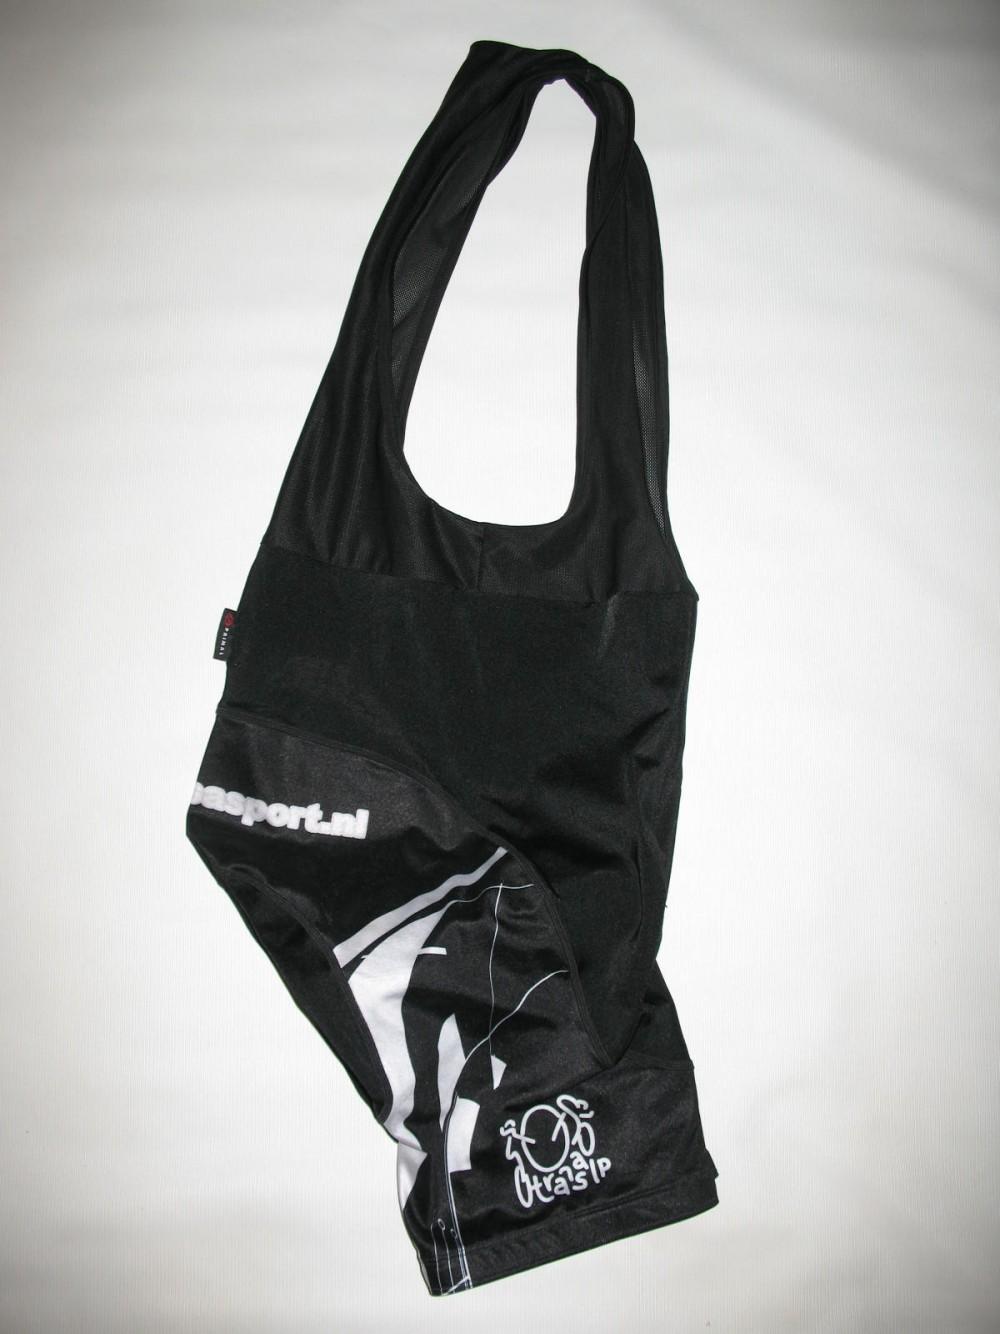 Велошорты PRIMAL transalp bib shorts (размер L) - 1